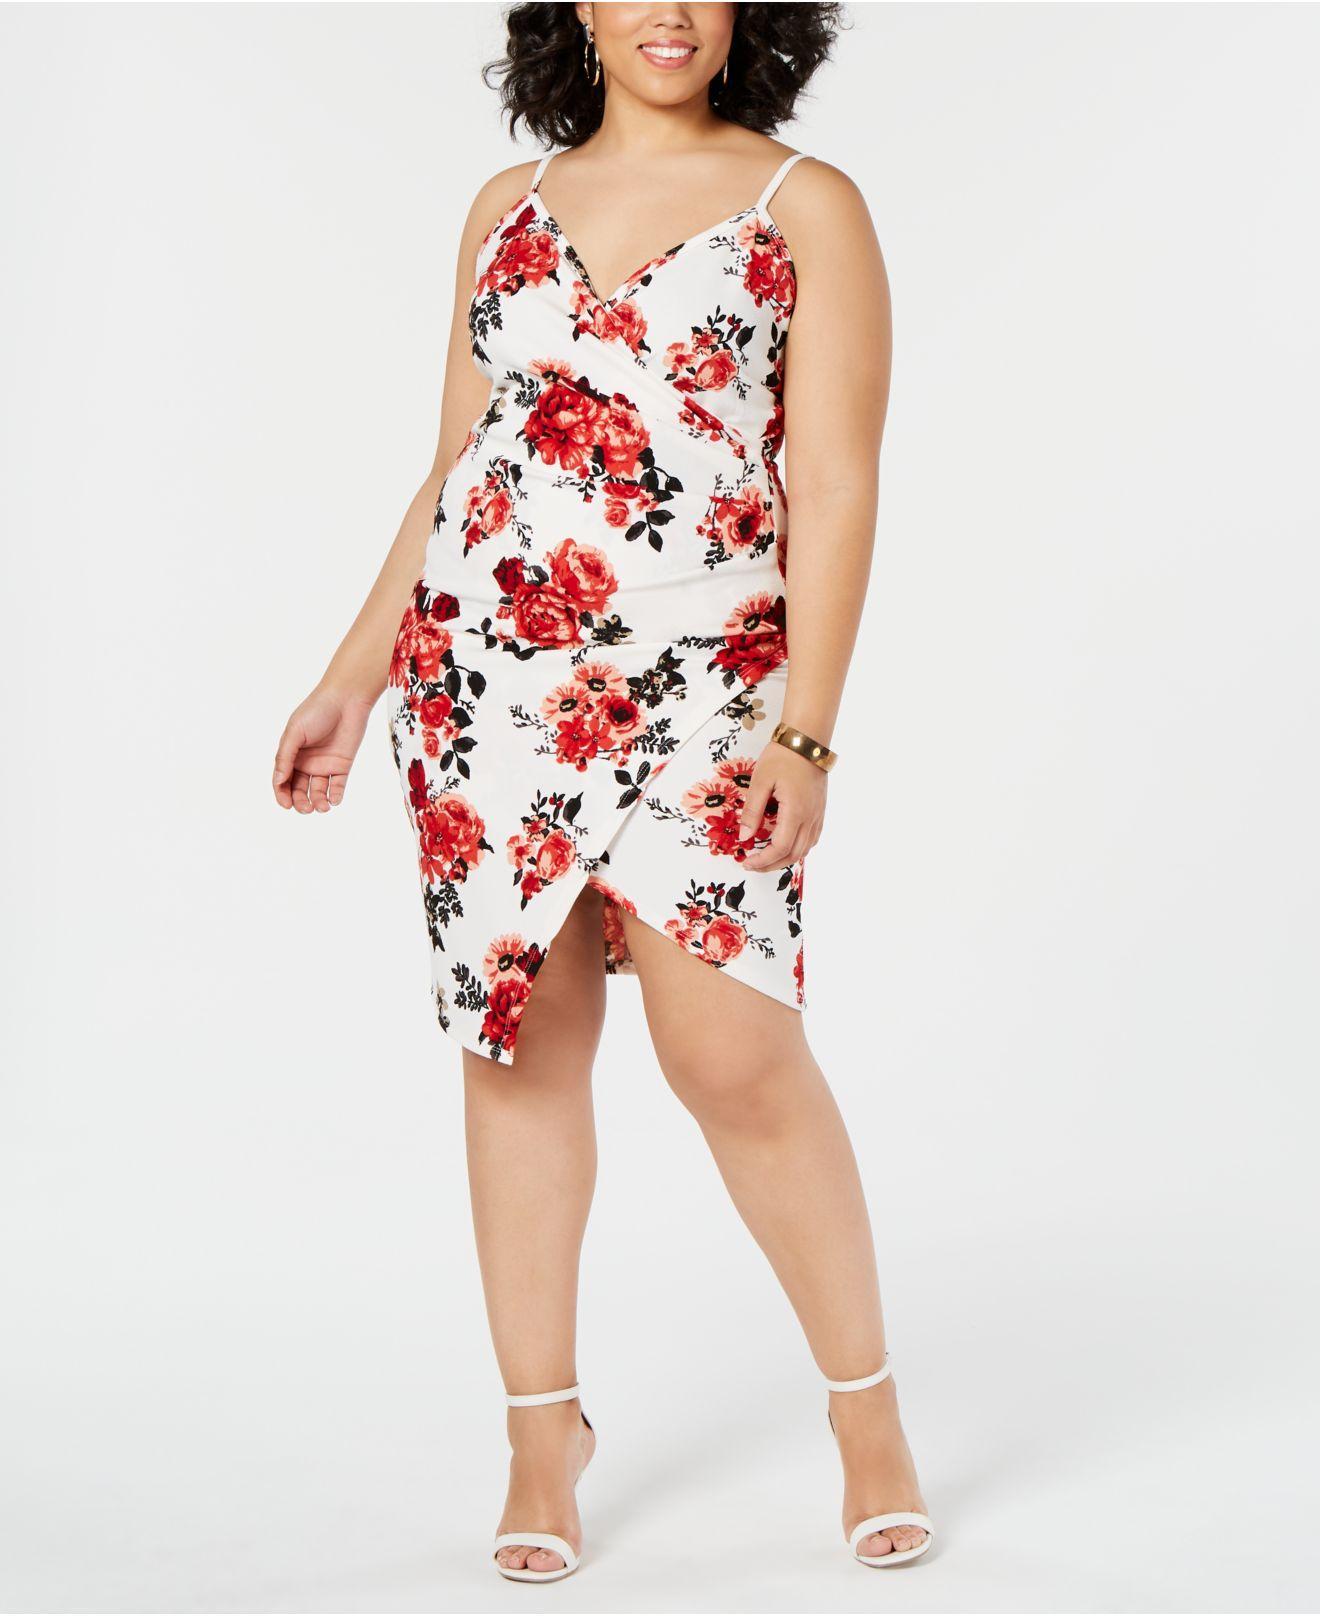 5504e51dbf9 Jr Plus Size Cocktail Dresses - Data Dynamic AG